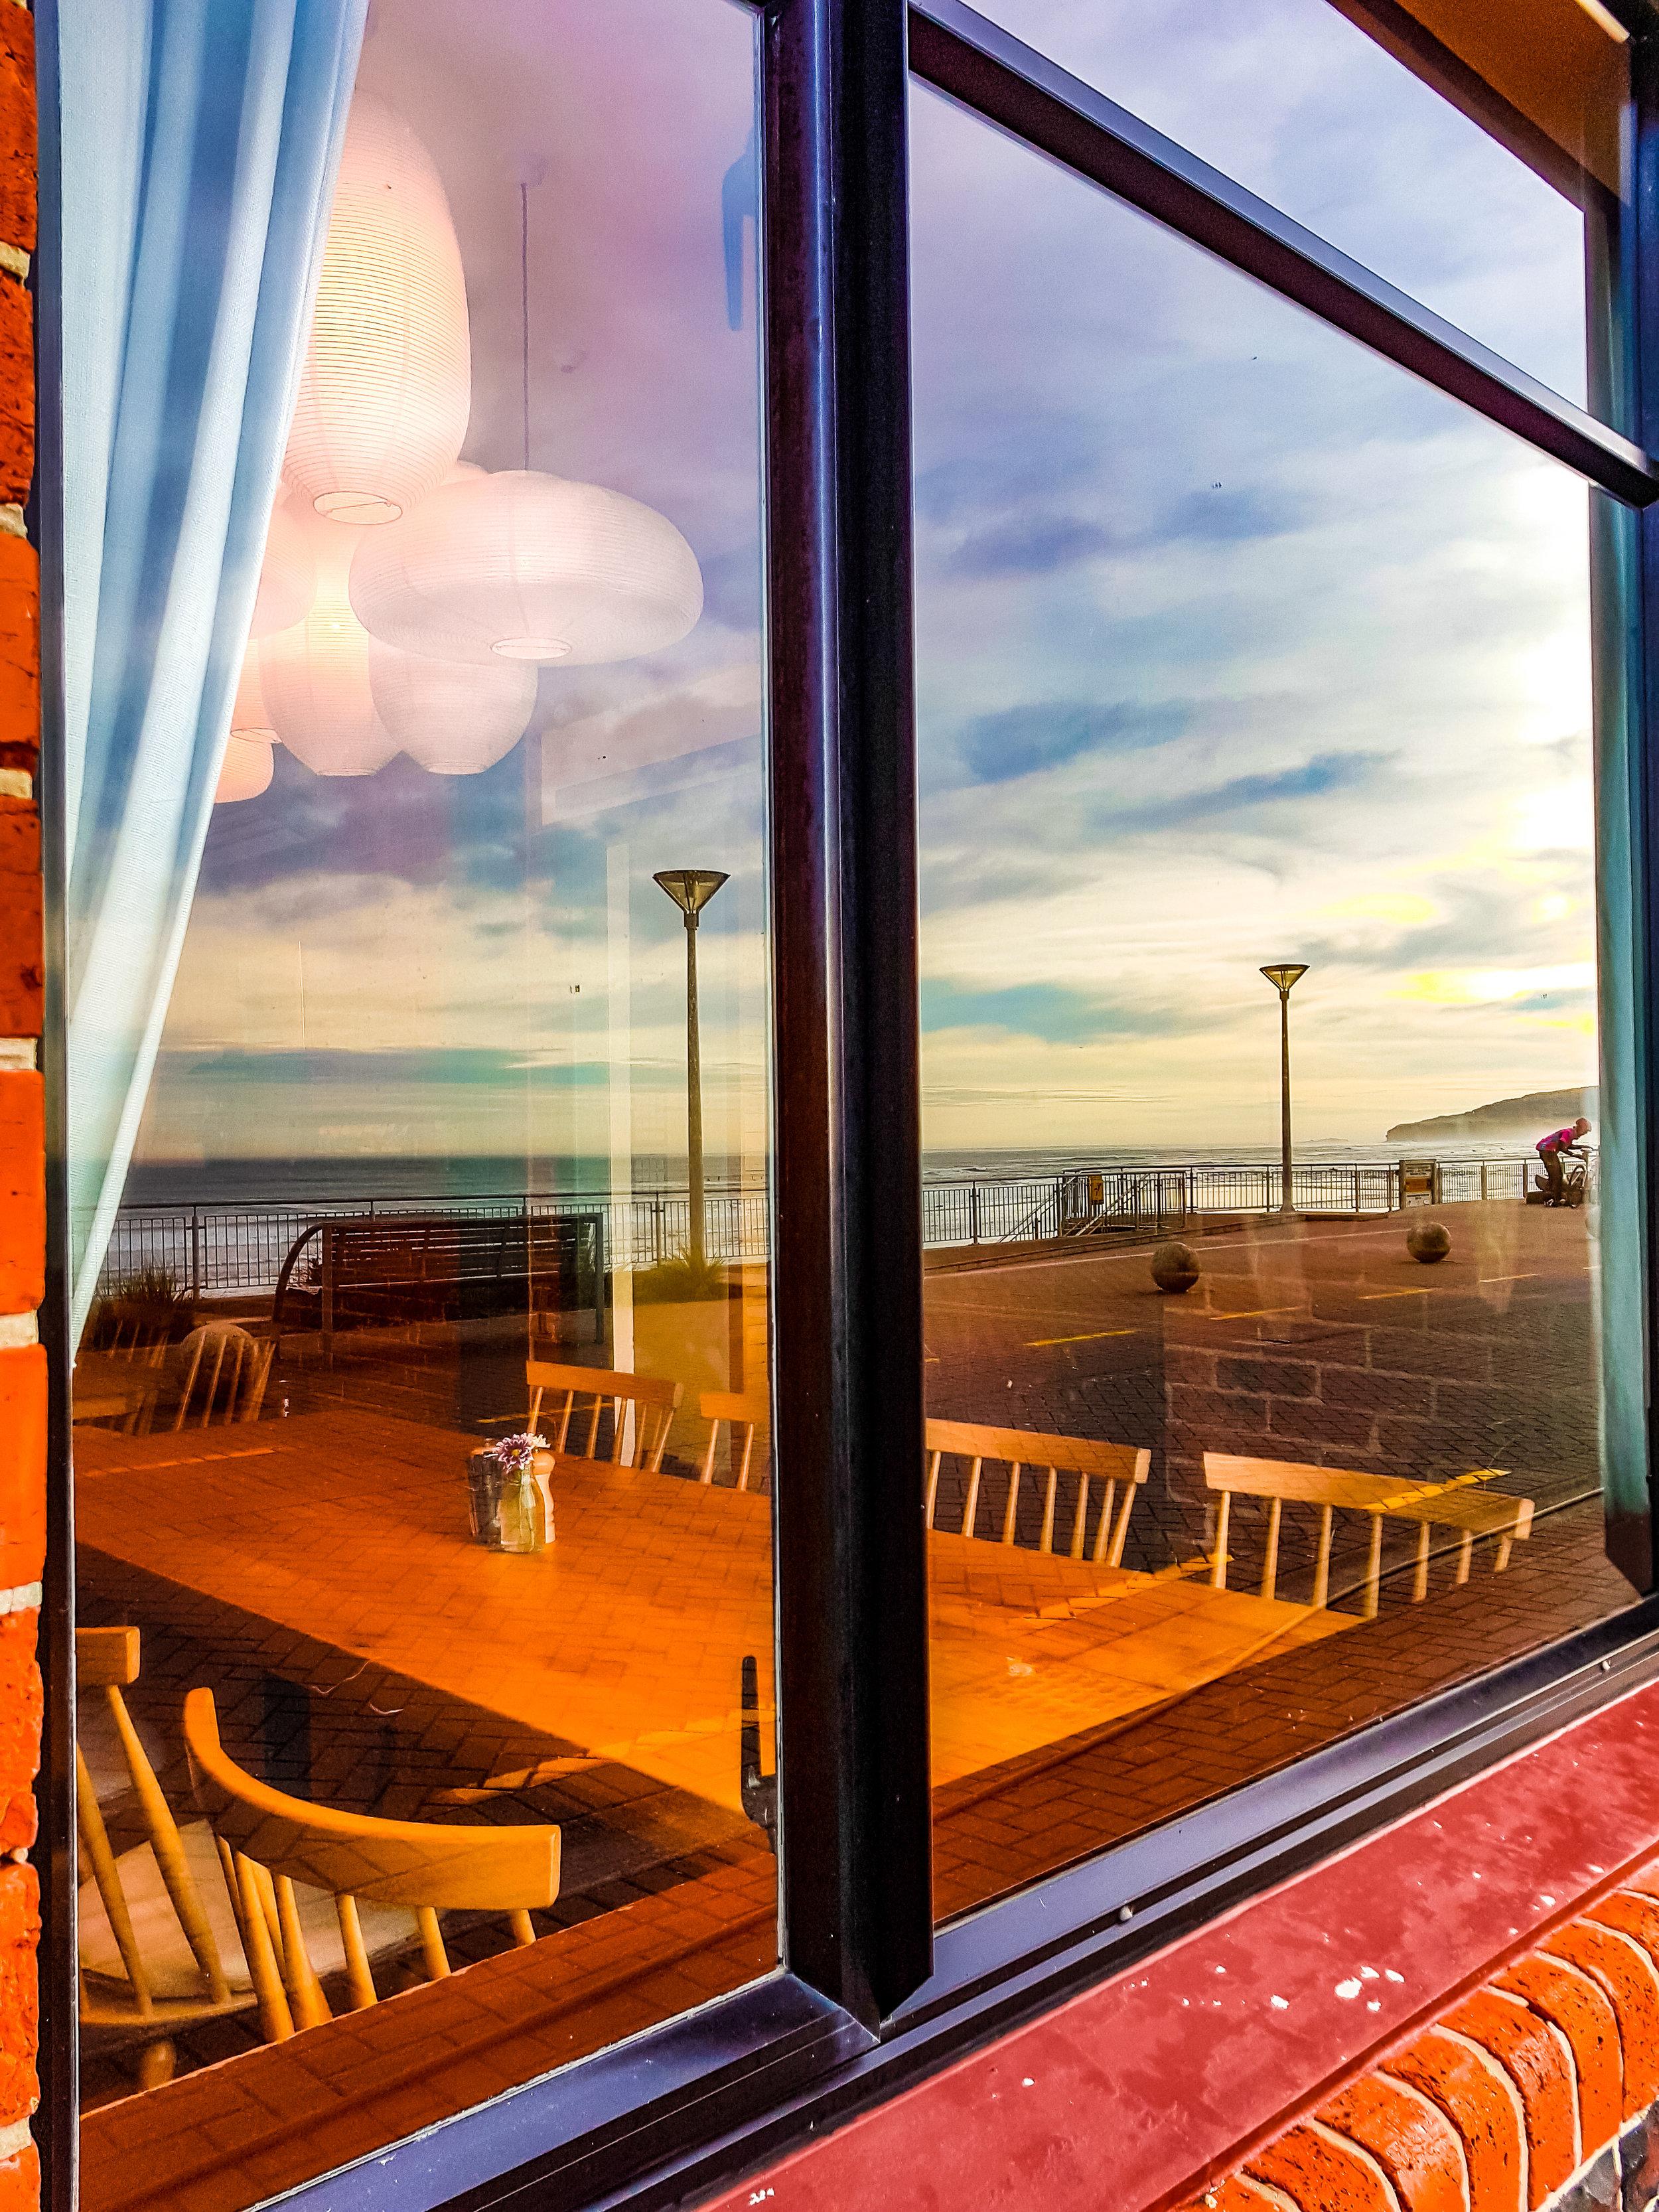 Table in a window at Esplanade restaurant Dunedin